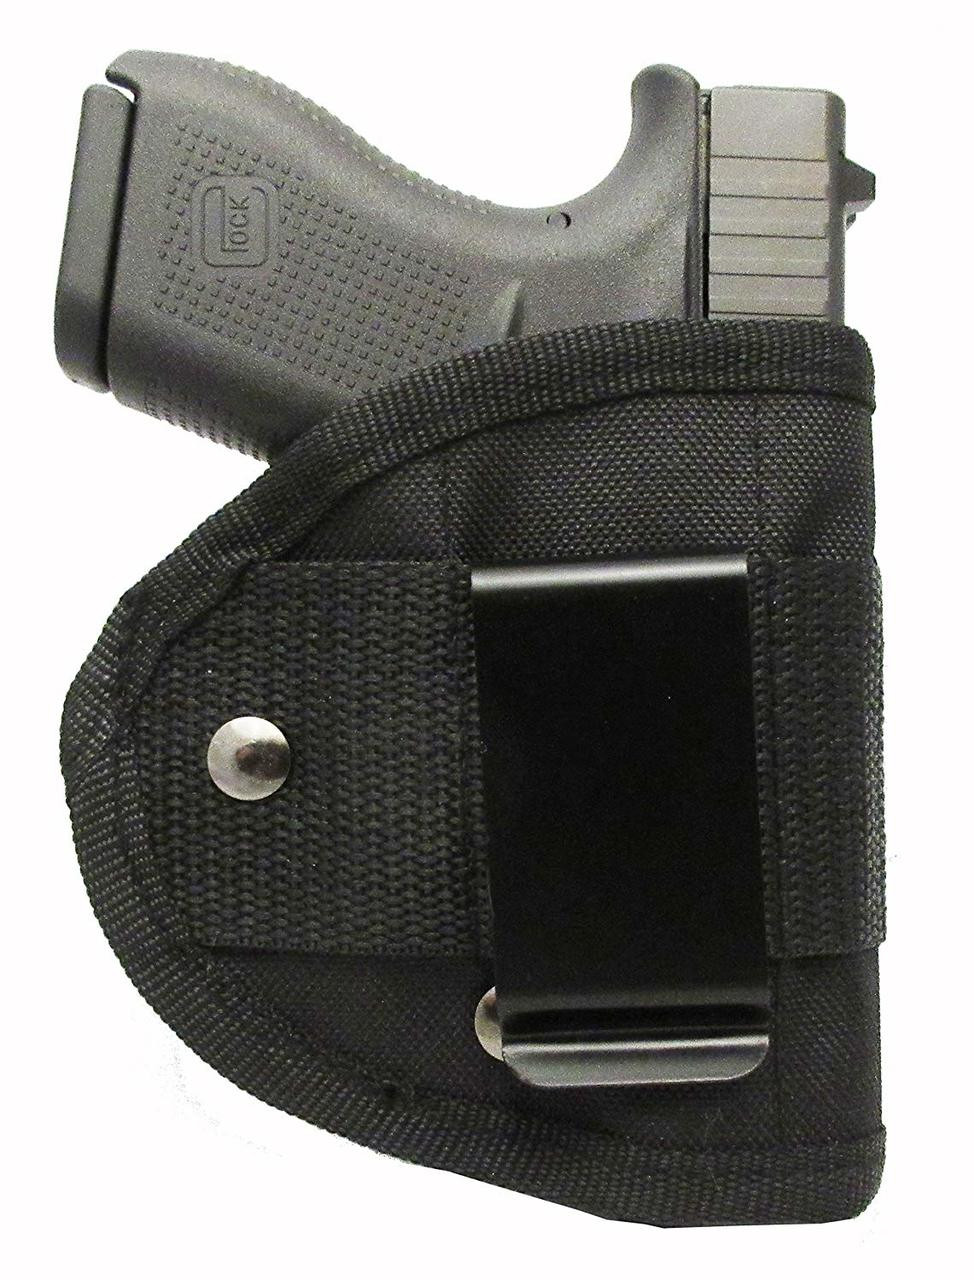 Garrison Grip Inside Waistband Woven Sling Holster Fits Glock 43 G43 9mm IWB (M4)